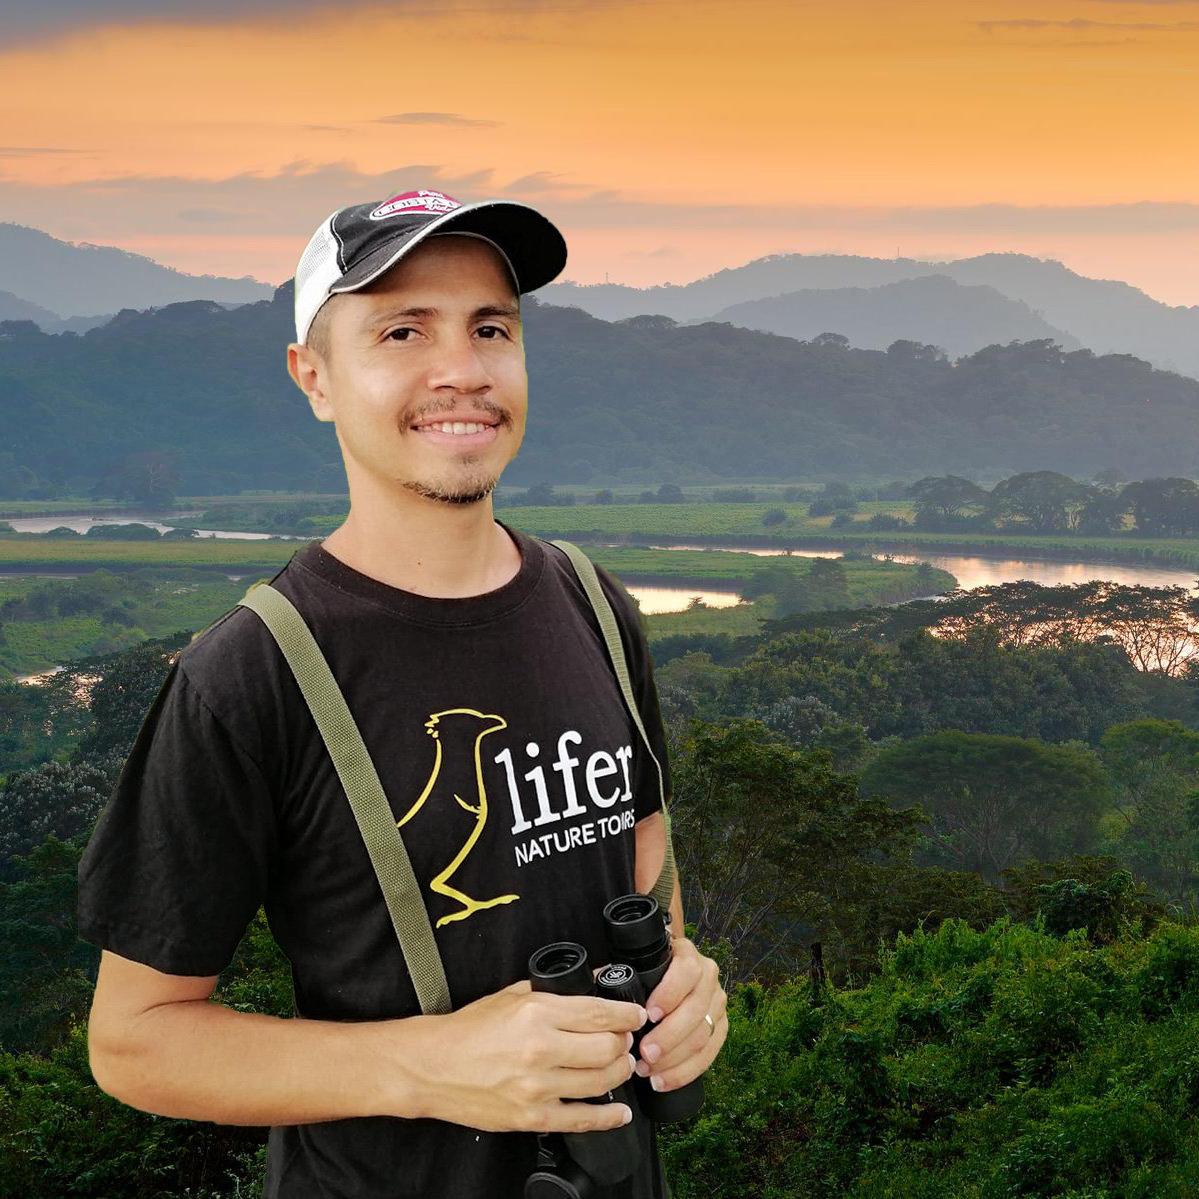 The Meca of Birding in Costa Rica